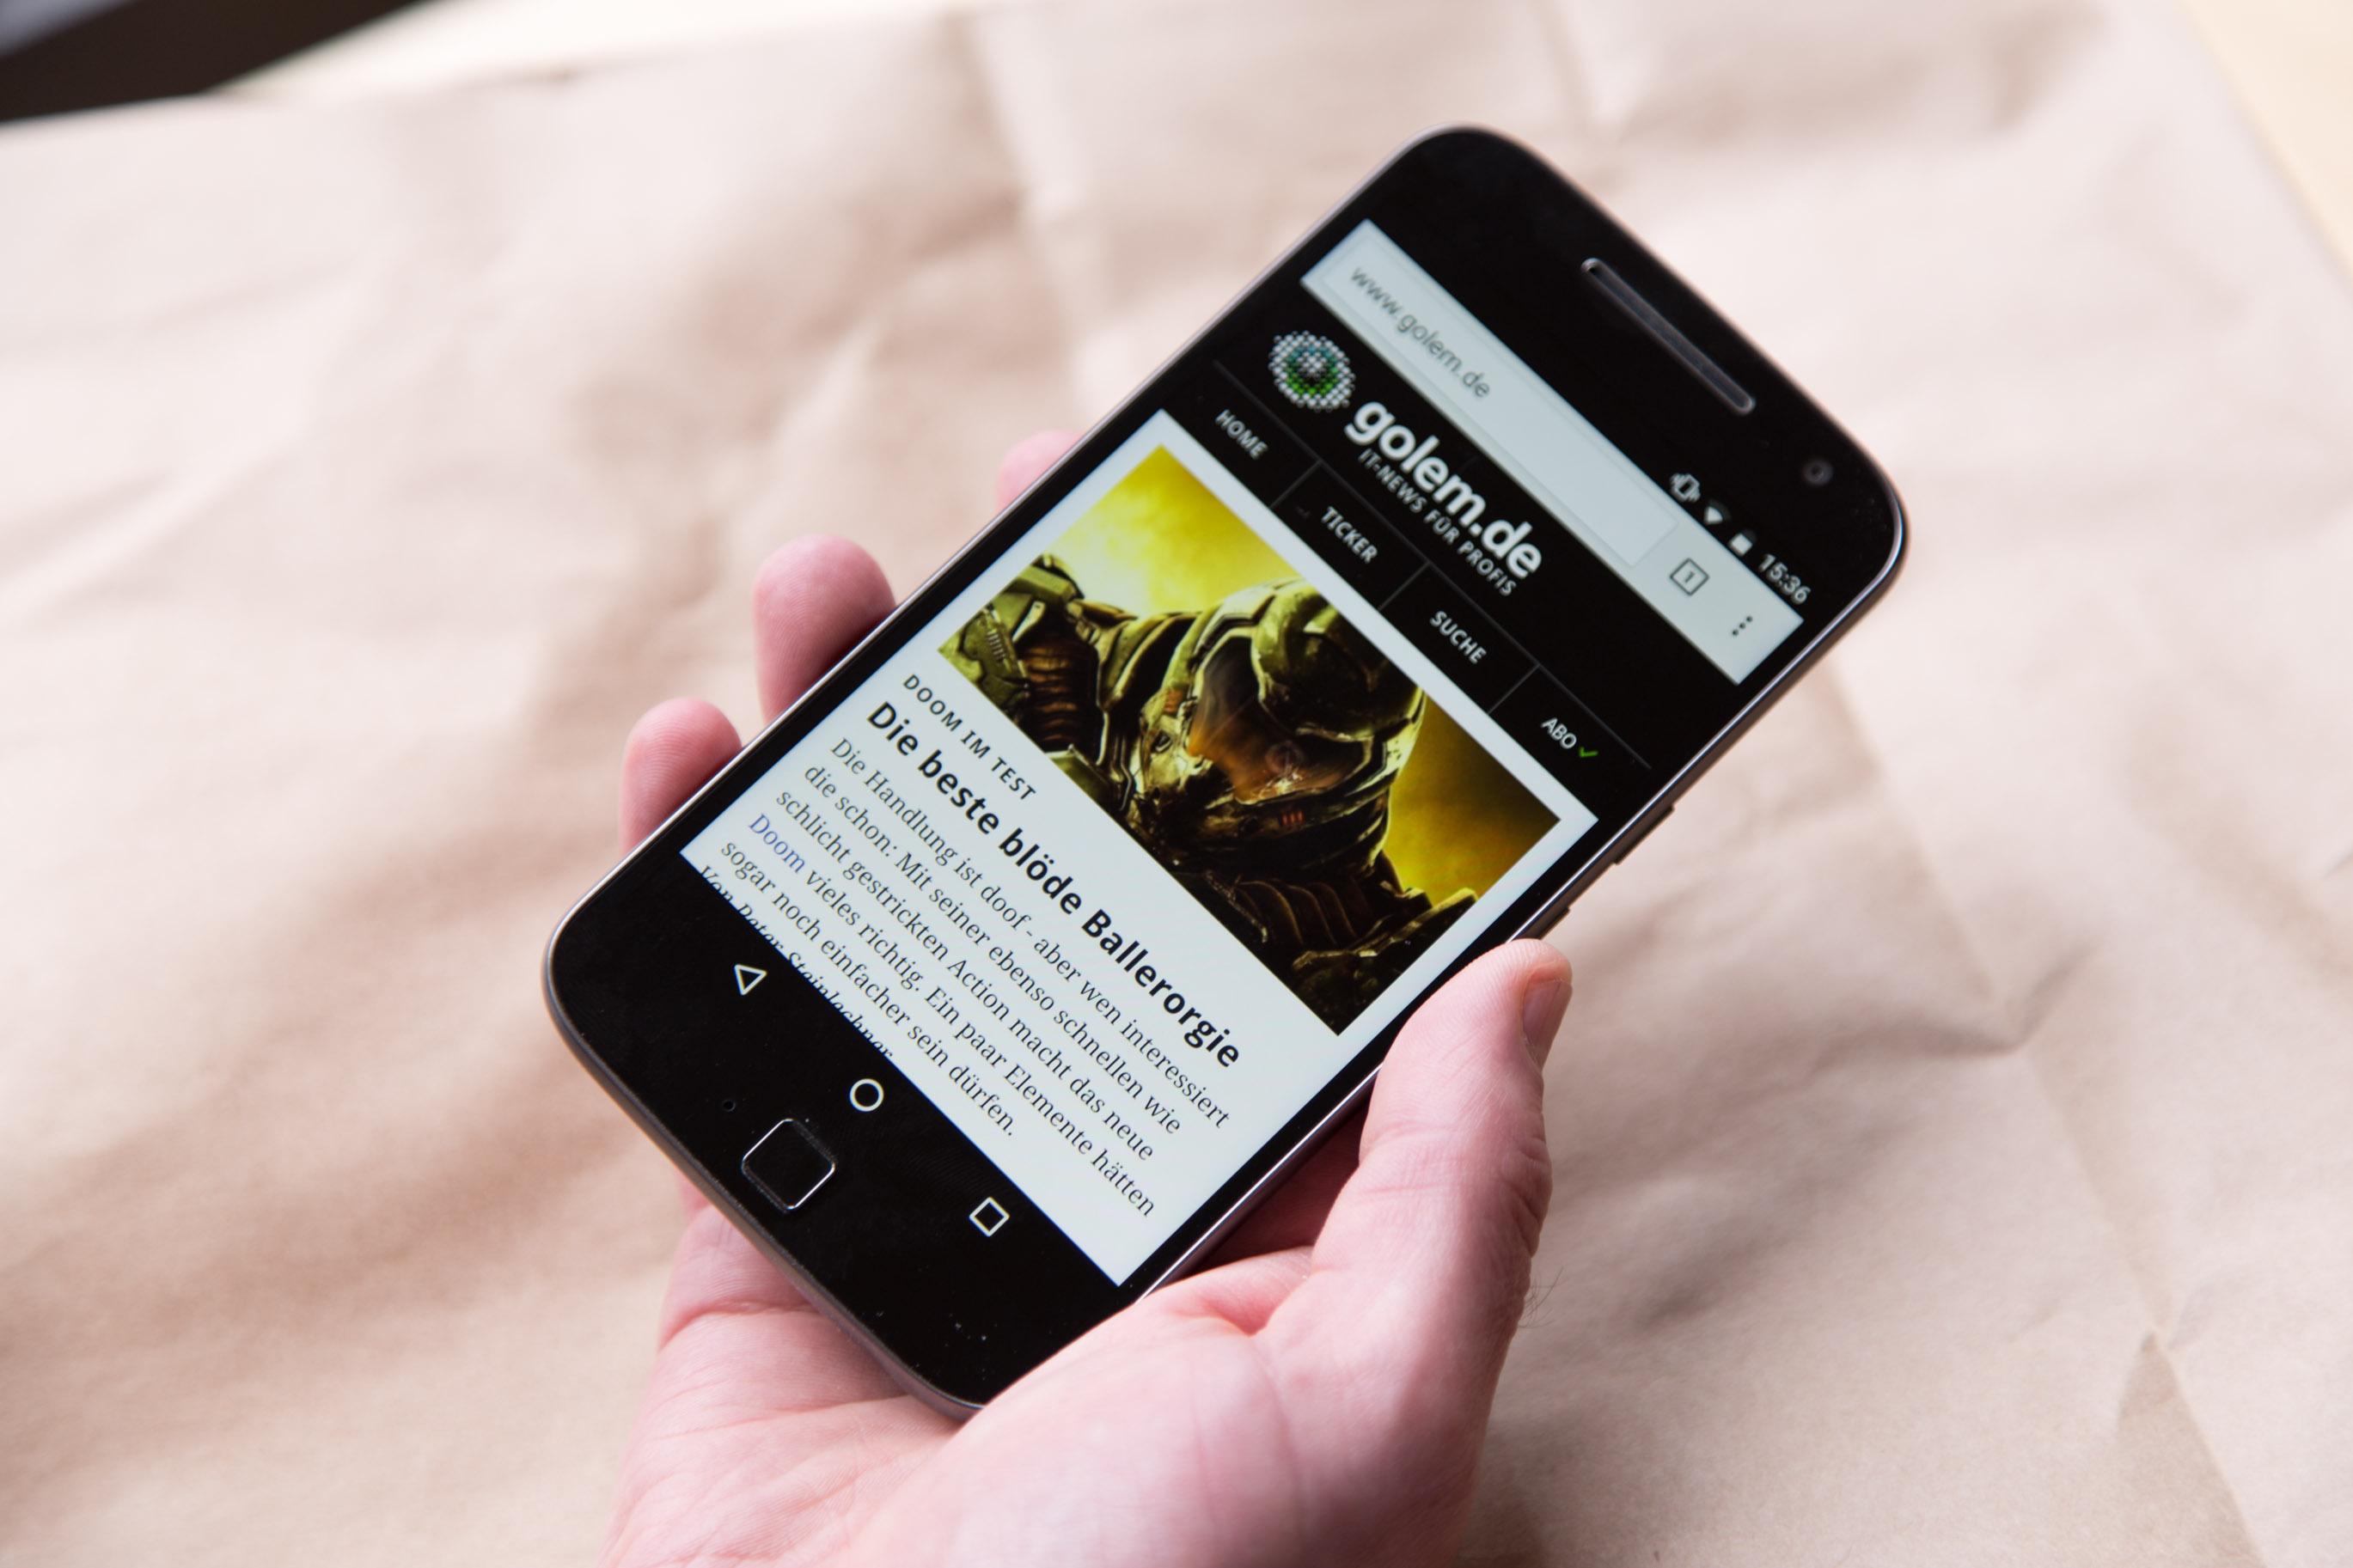 Moto G4 Plus im Hands on: Lenovos sonderbare Entscheidung - Lenovos Moto G4 Plus (Bild: Martin Wolf/Golem.de)